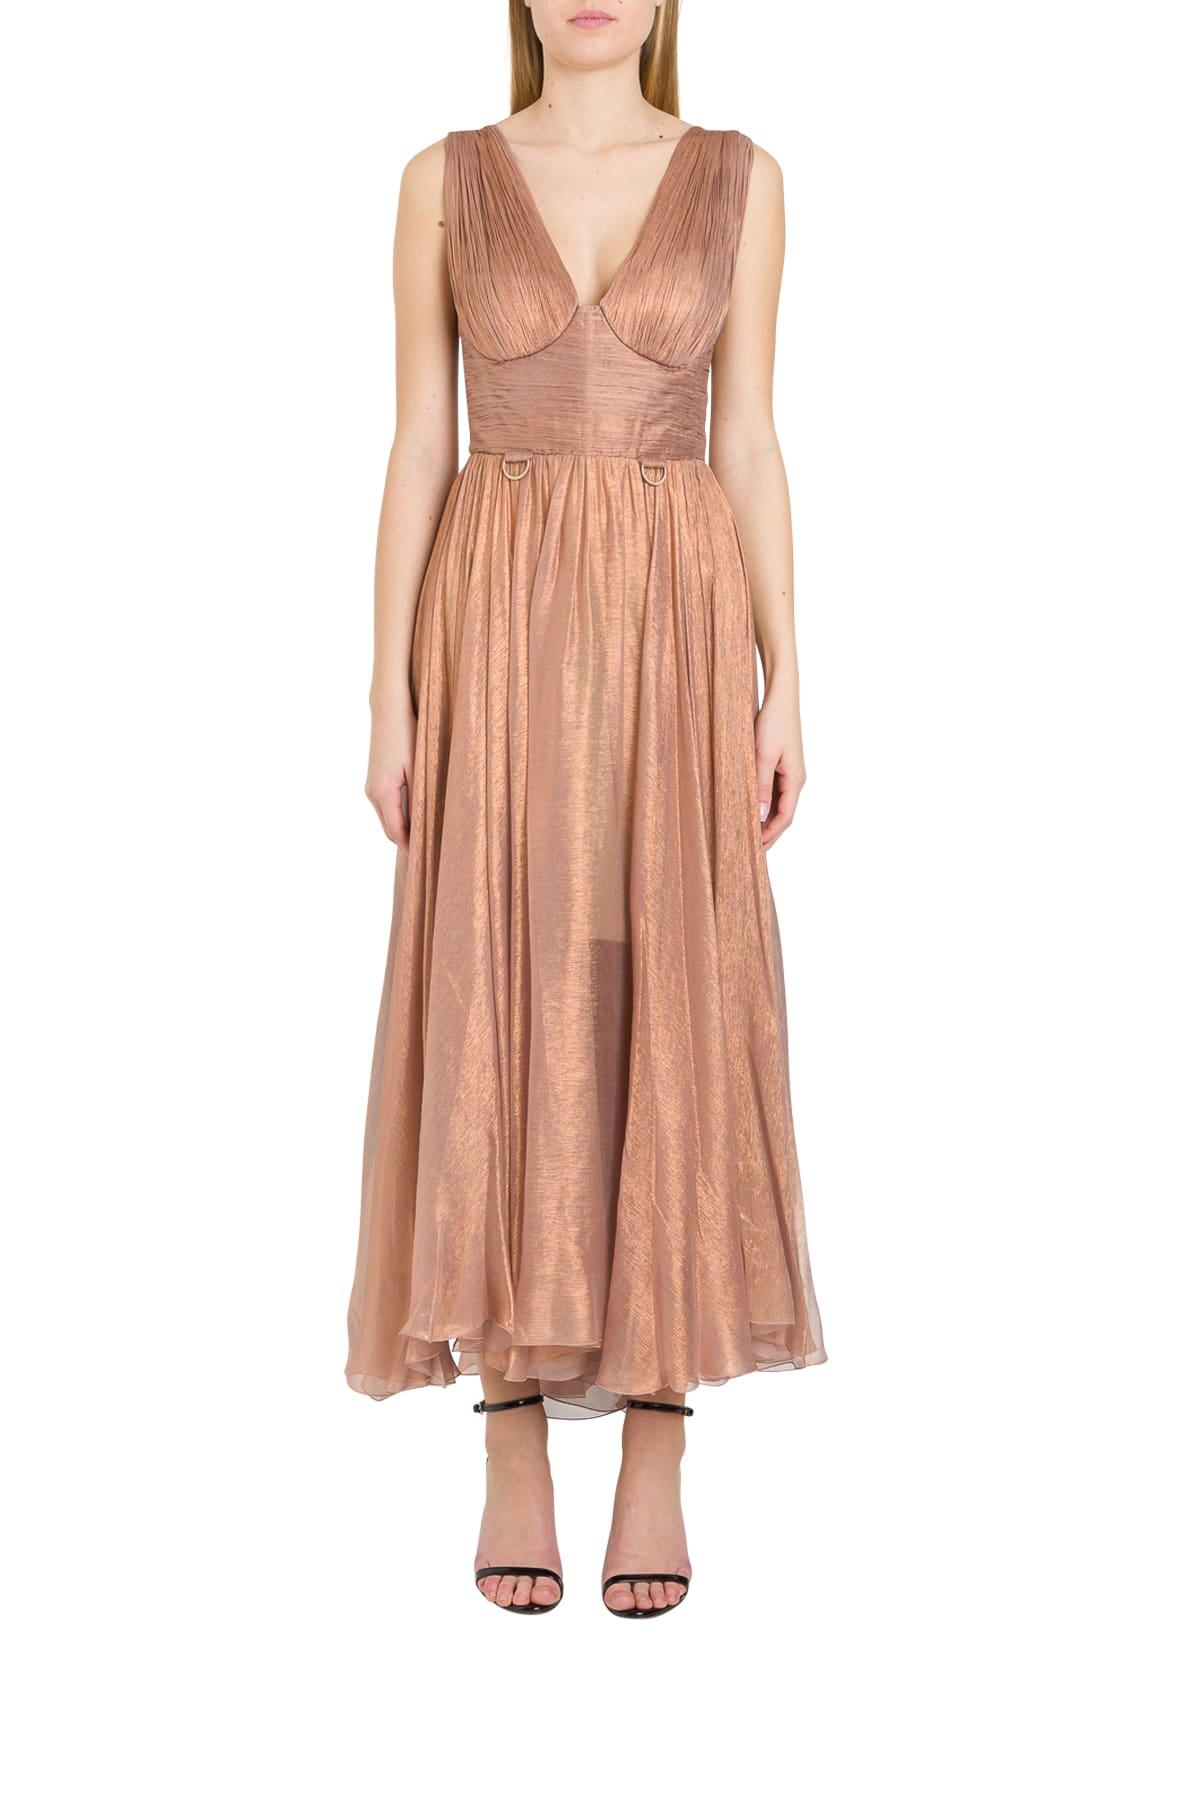 Buy Maria Lucia Hohan Sorean Dress online, shop Maria Lucia Hohan with free shipping